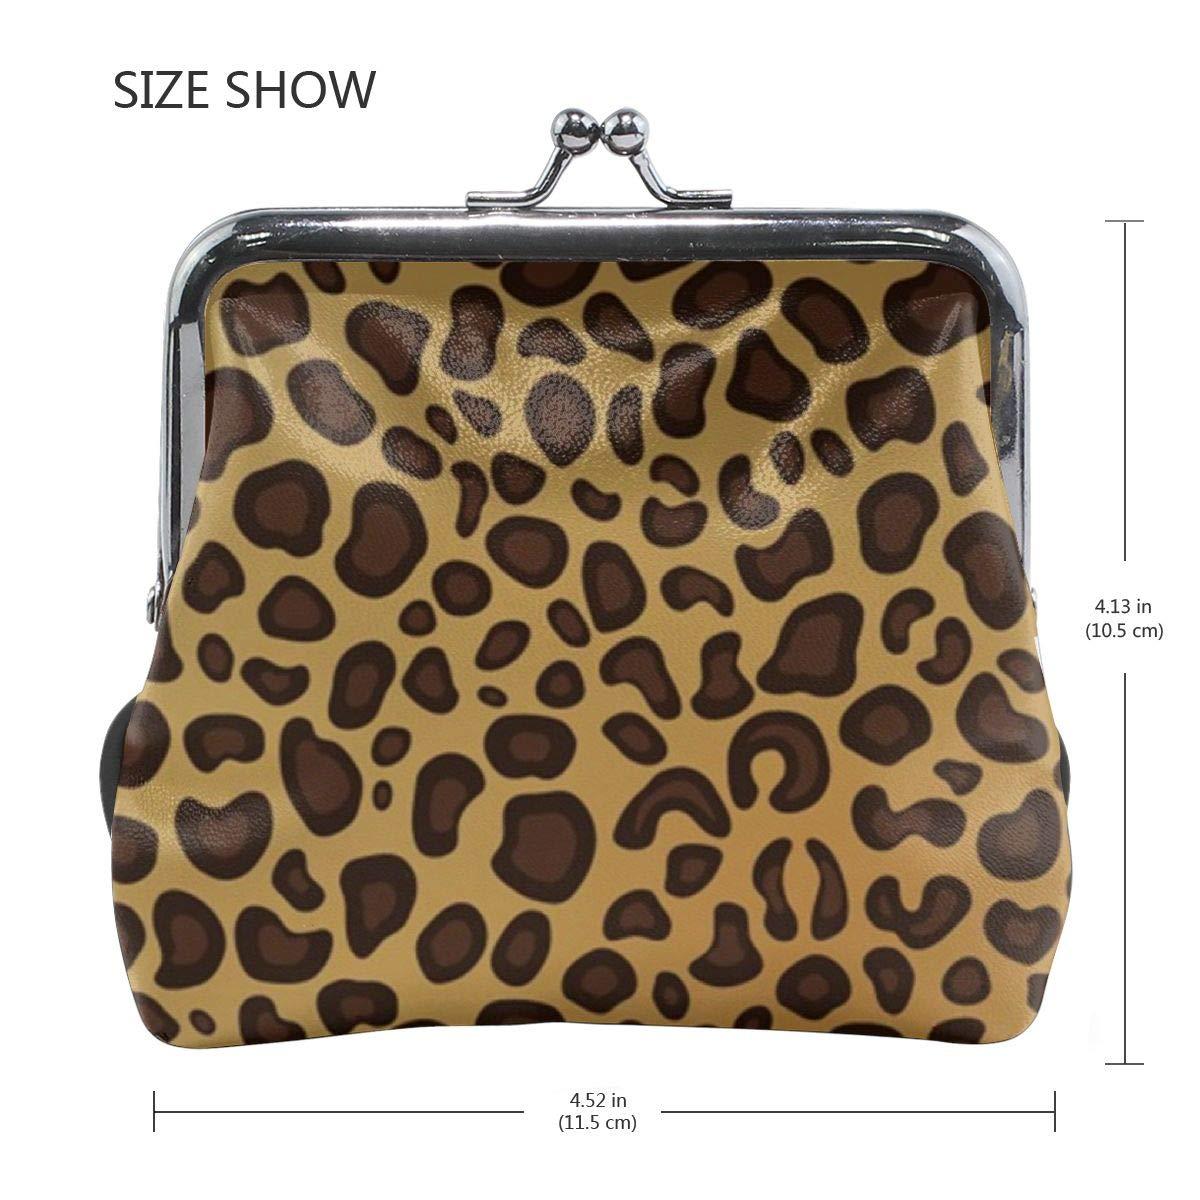 TYDhey Classic Leopard Skin Print Pattern Classic Buckle Coin Purses Leather Kiss-Lock Change Wallets